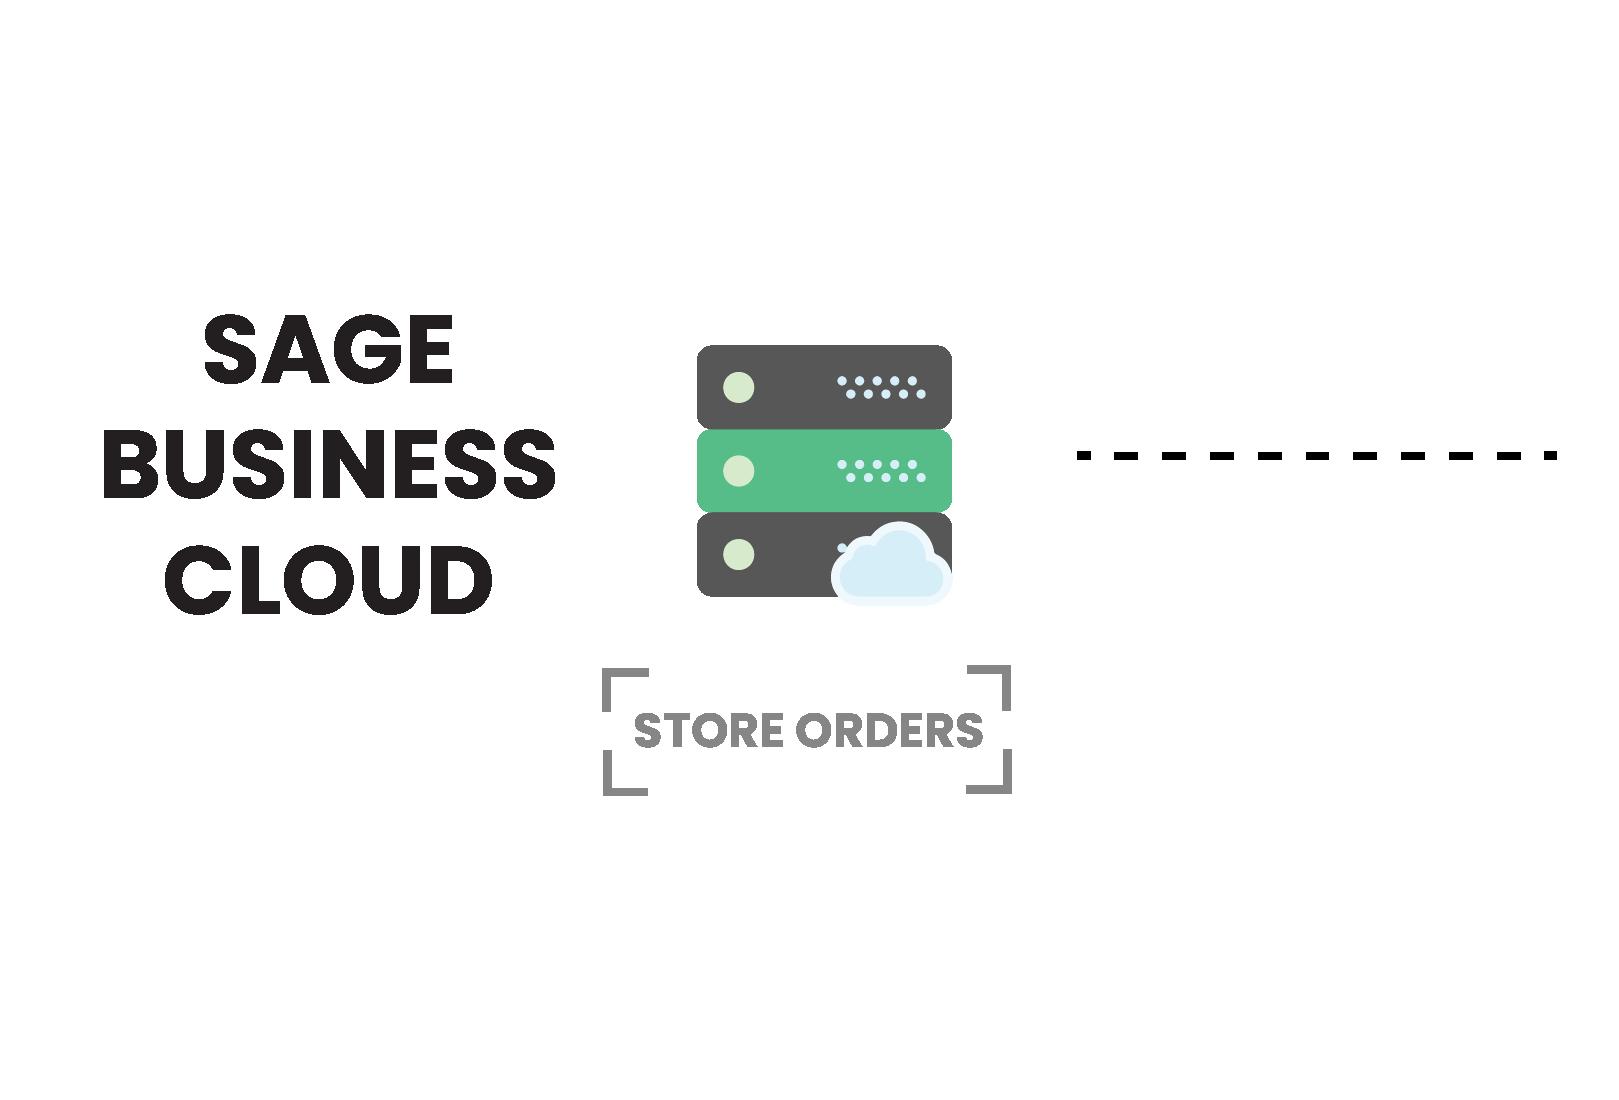 Sage Business Cloud B2B eCommerce Integration - Storehub.io